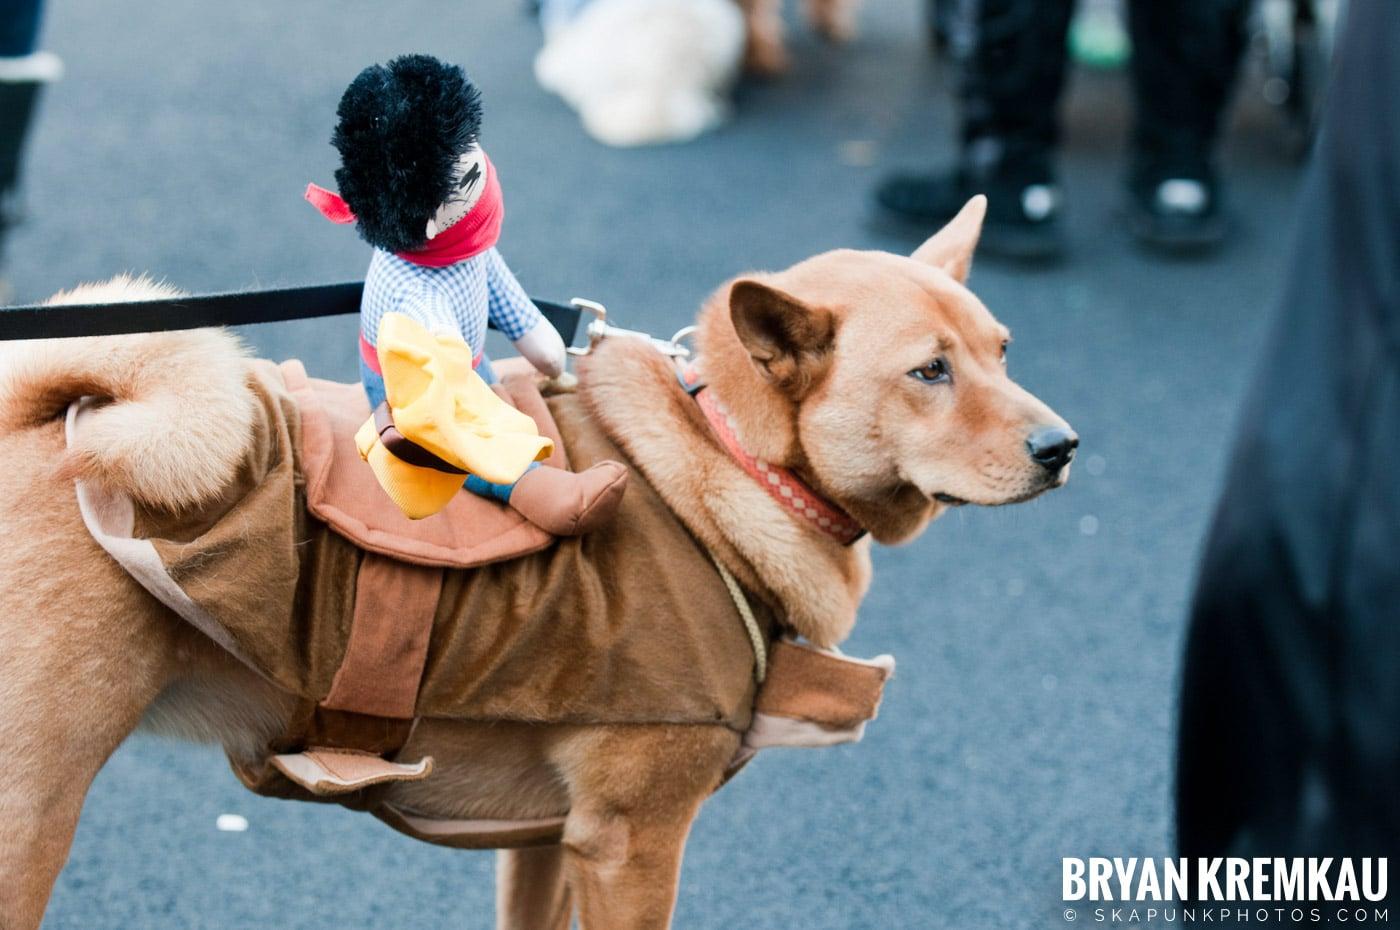 Paulus Hook Halloween Pet Parade 2011 @ Jersey City, NJ - 10.30.11 (49)